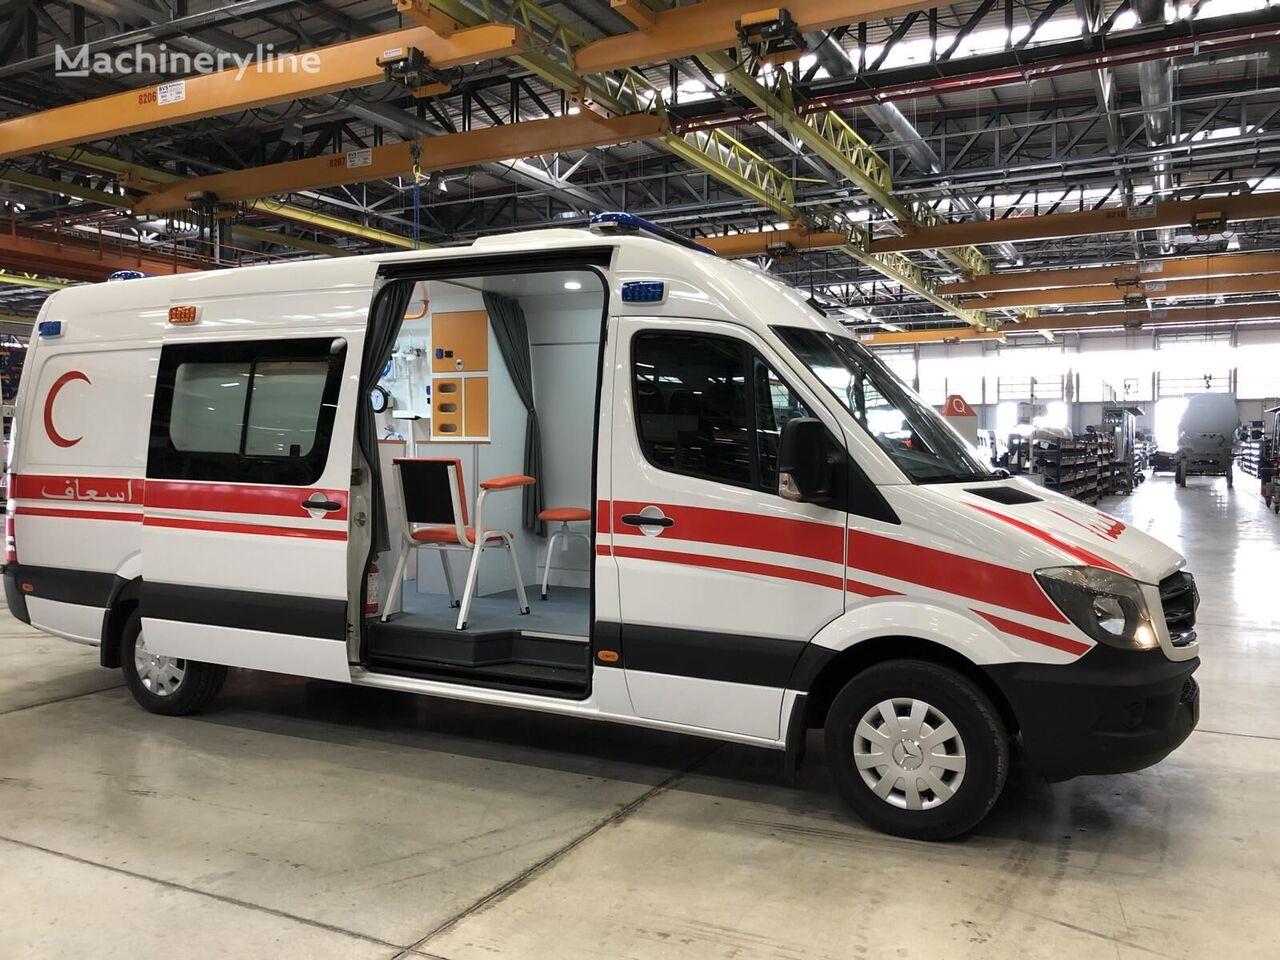 new MERCEDES-BENZ Sprinter 316 CDI ambulance